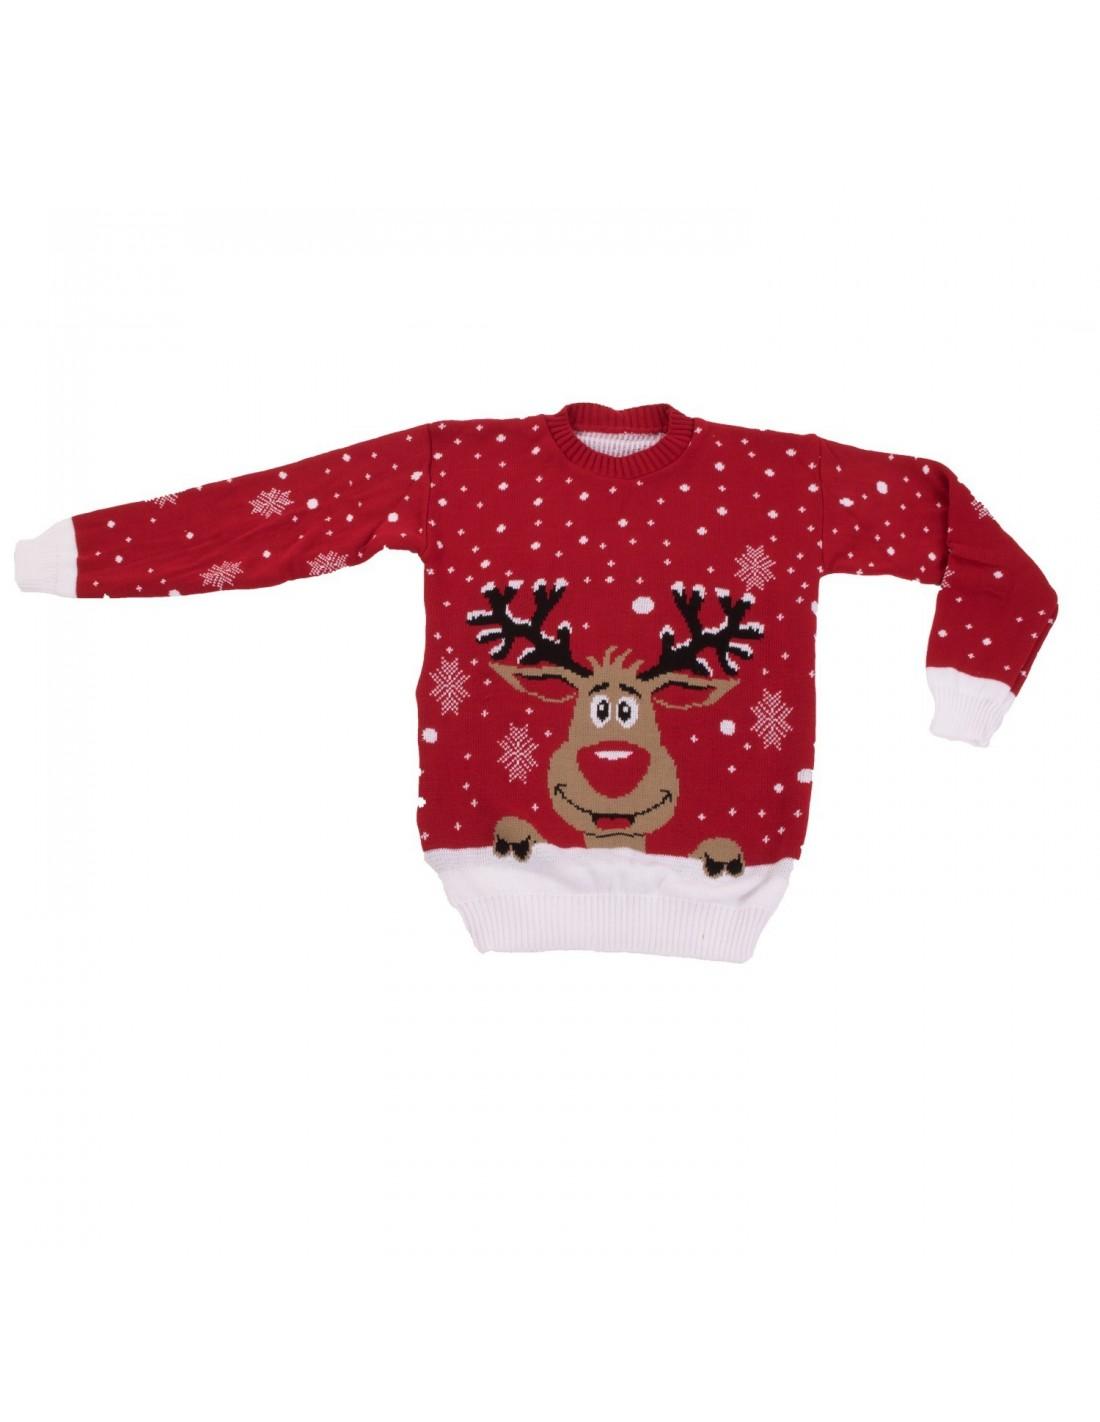 25636bb172602 Pull de Noël femme effet laine tête de renne & flocon de neige